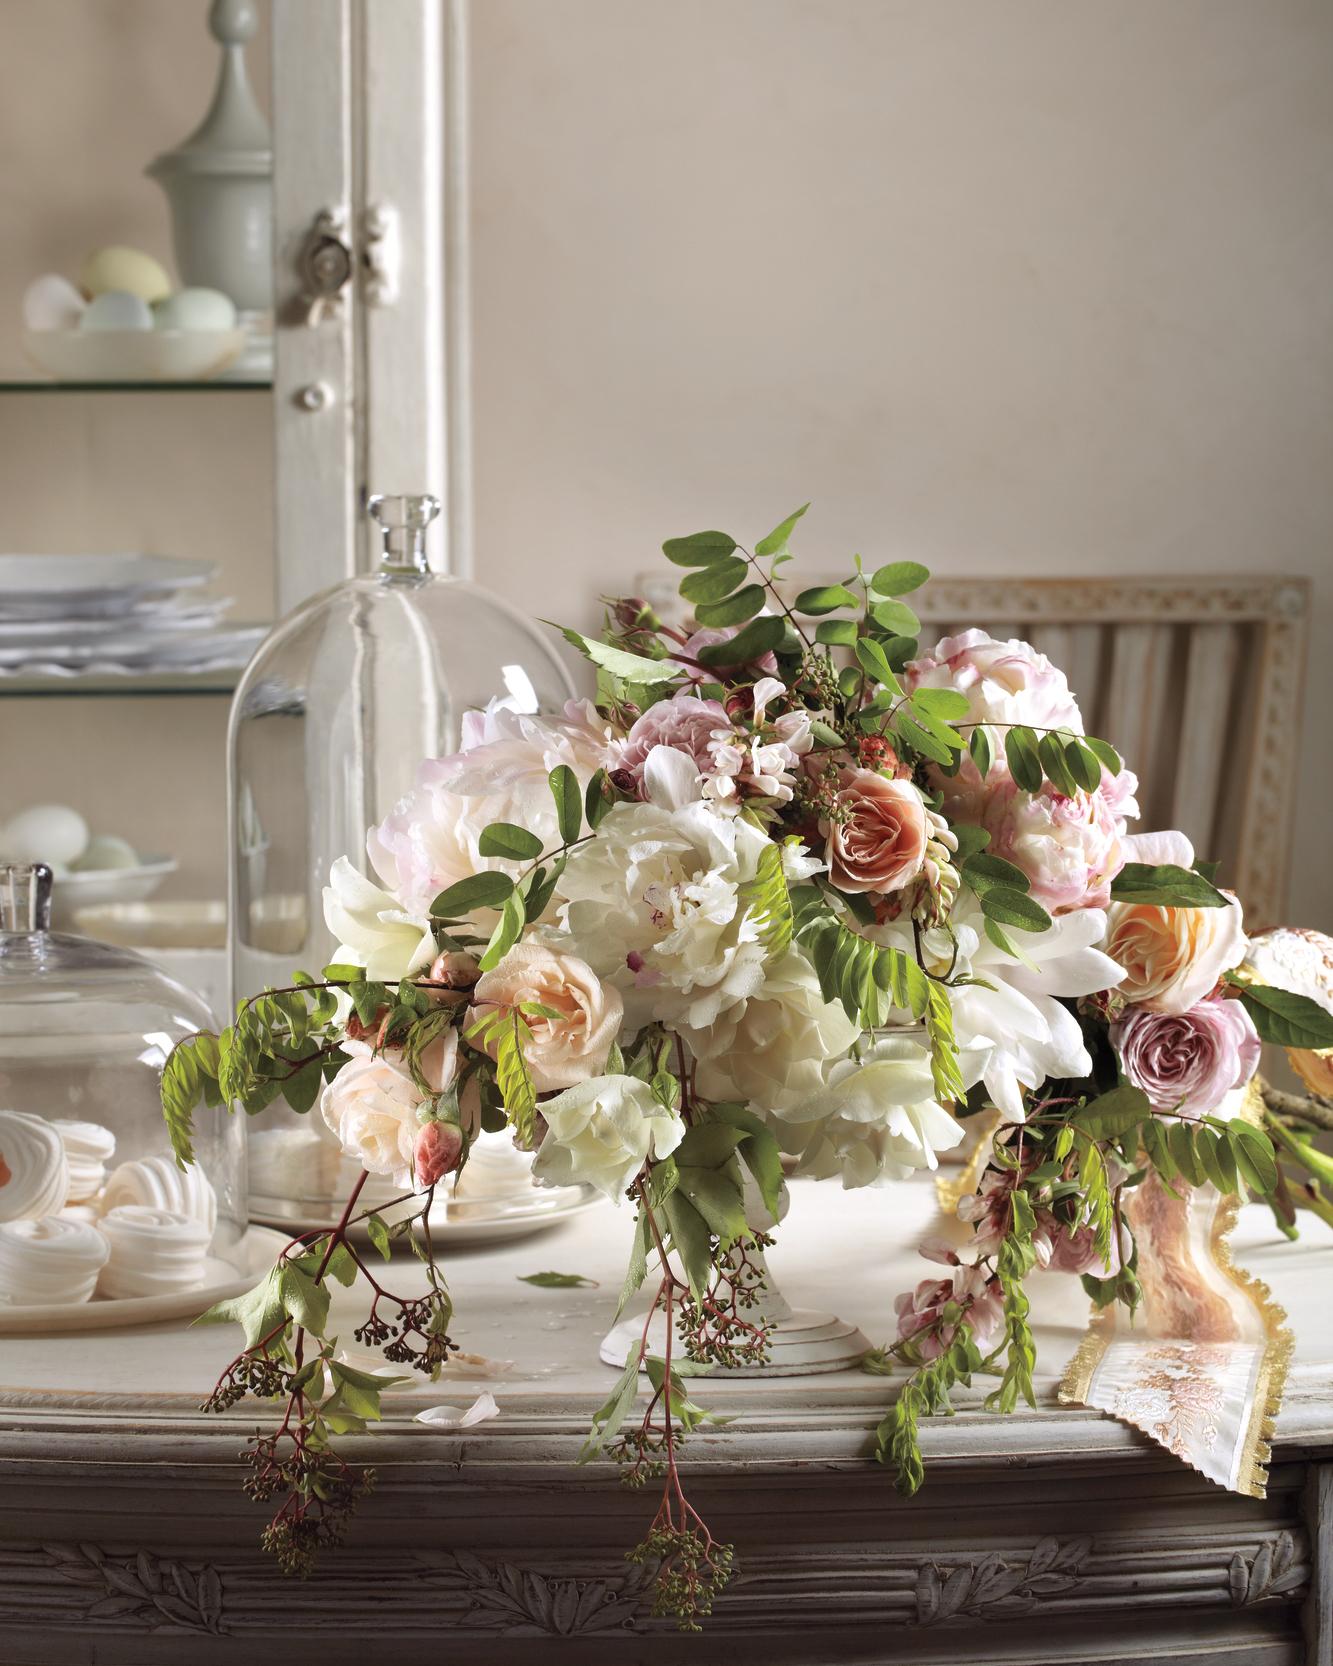 flowers-romantic-garden-107-r-mwd108999.jpg